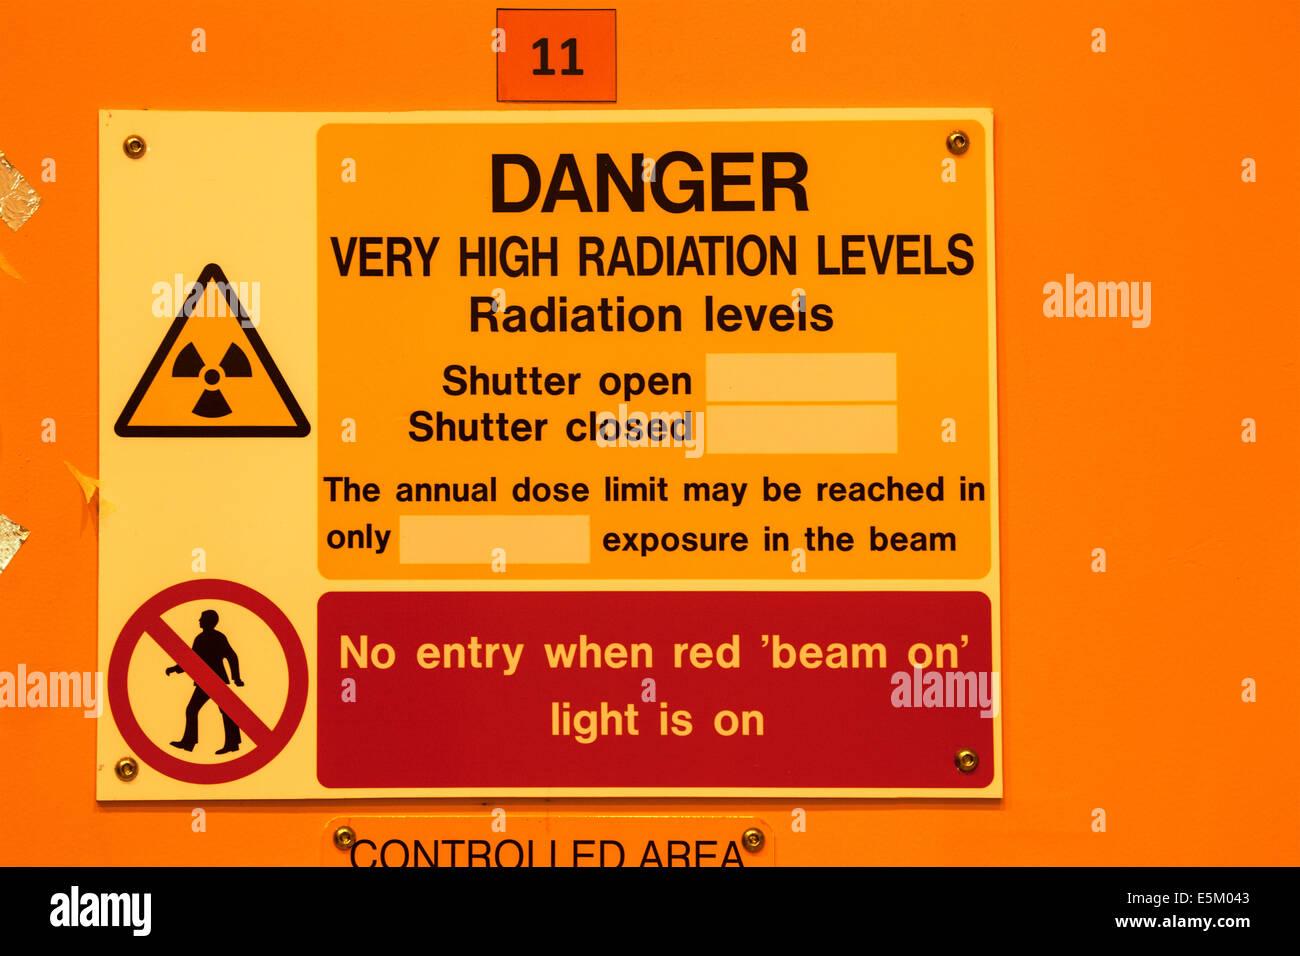 Radiation warning outside a laboratory in a scientific reseach establishment. Stock Photo